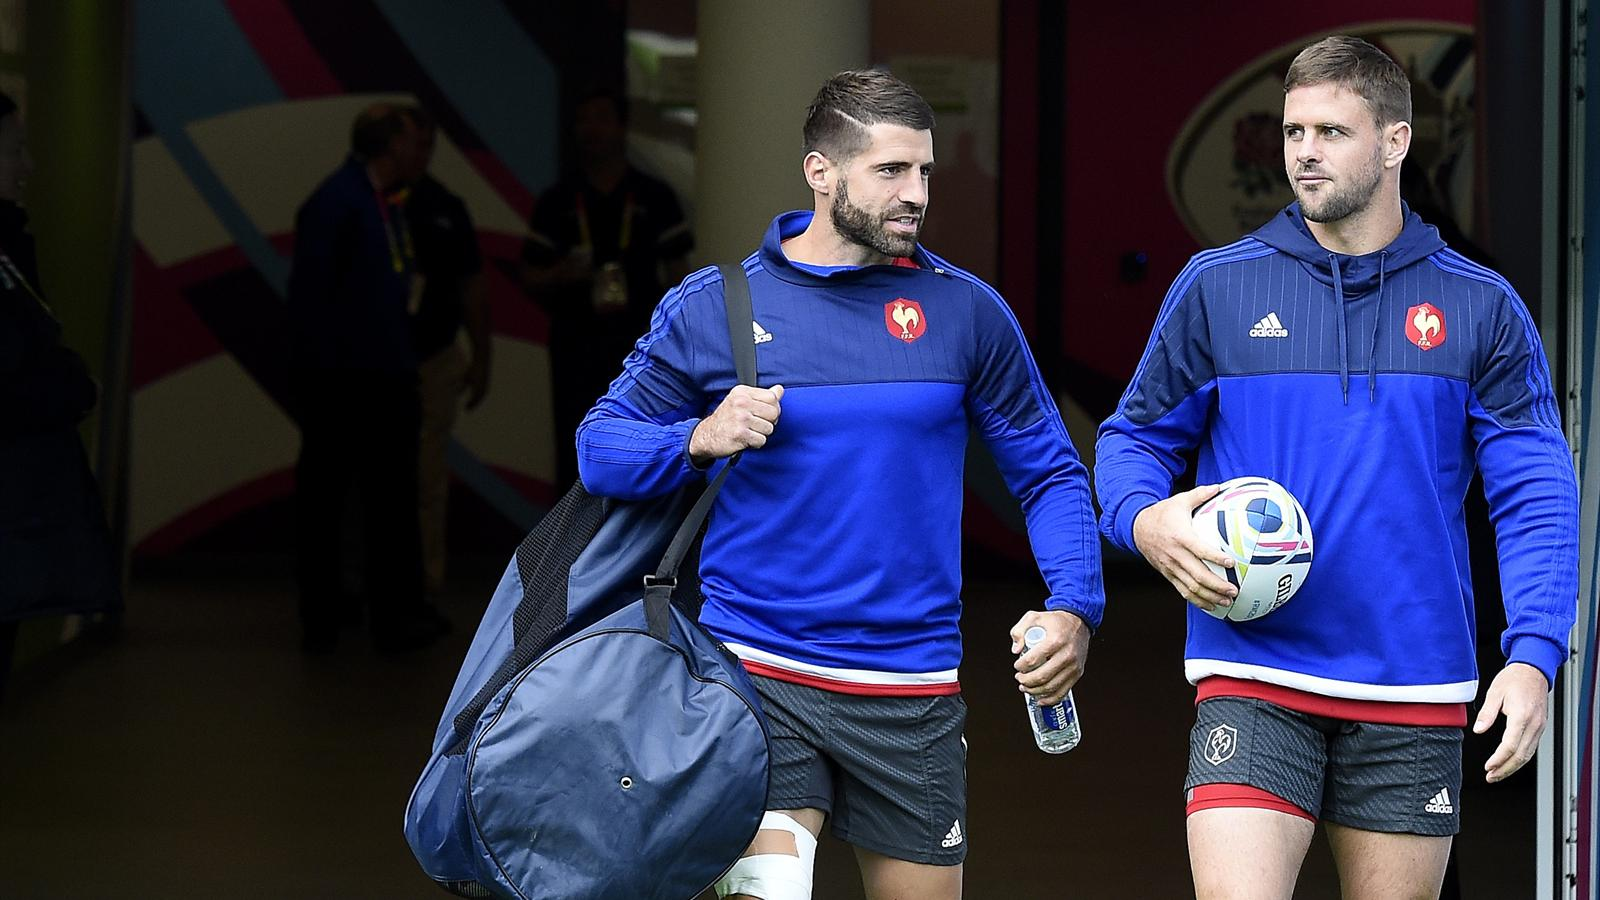 Sébastien Tillous-Borde et Rory Kockott (XV de France) - 17 septembre 2015